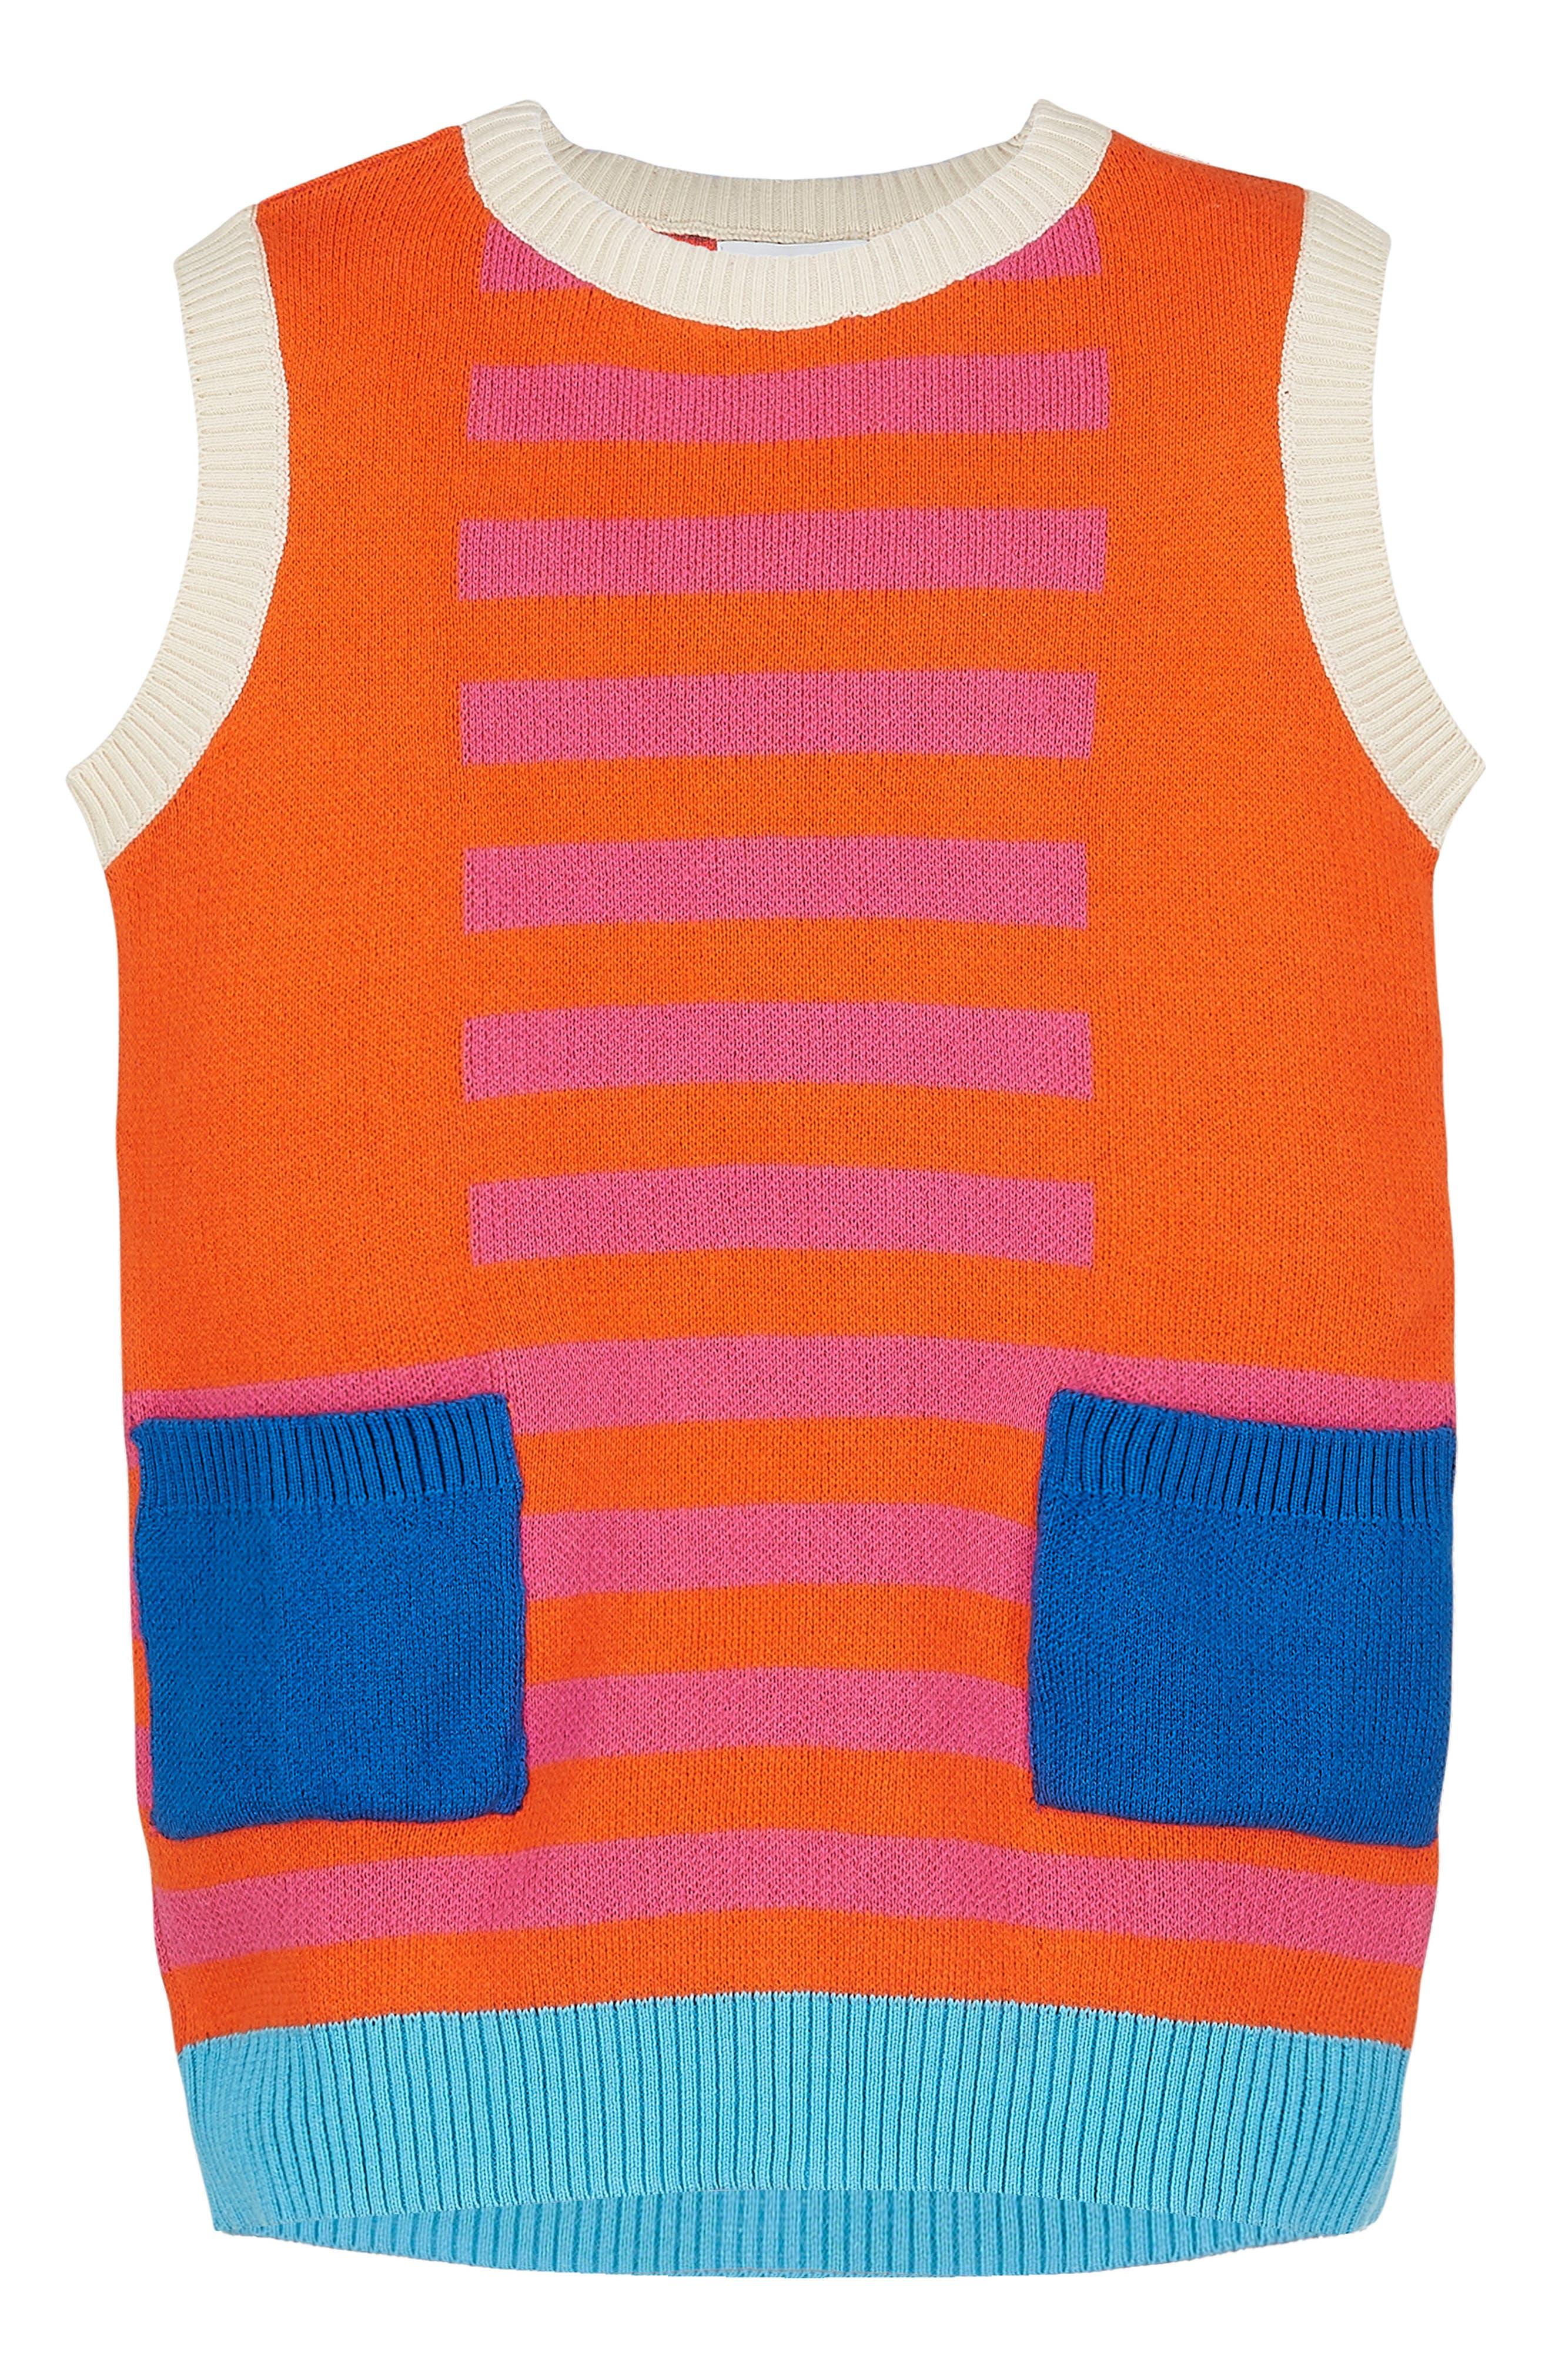 Alternate Image 1 Selected - Margherita Retro Colorblock Sweater Knit Dress (Toddler Girls & Little Girls)